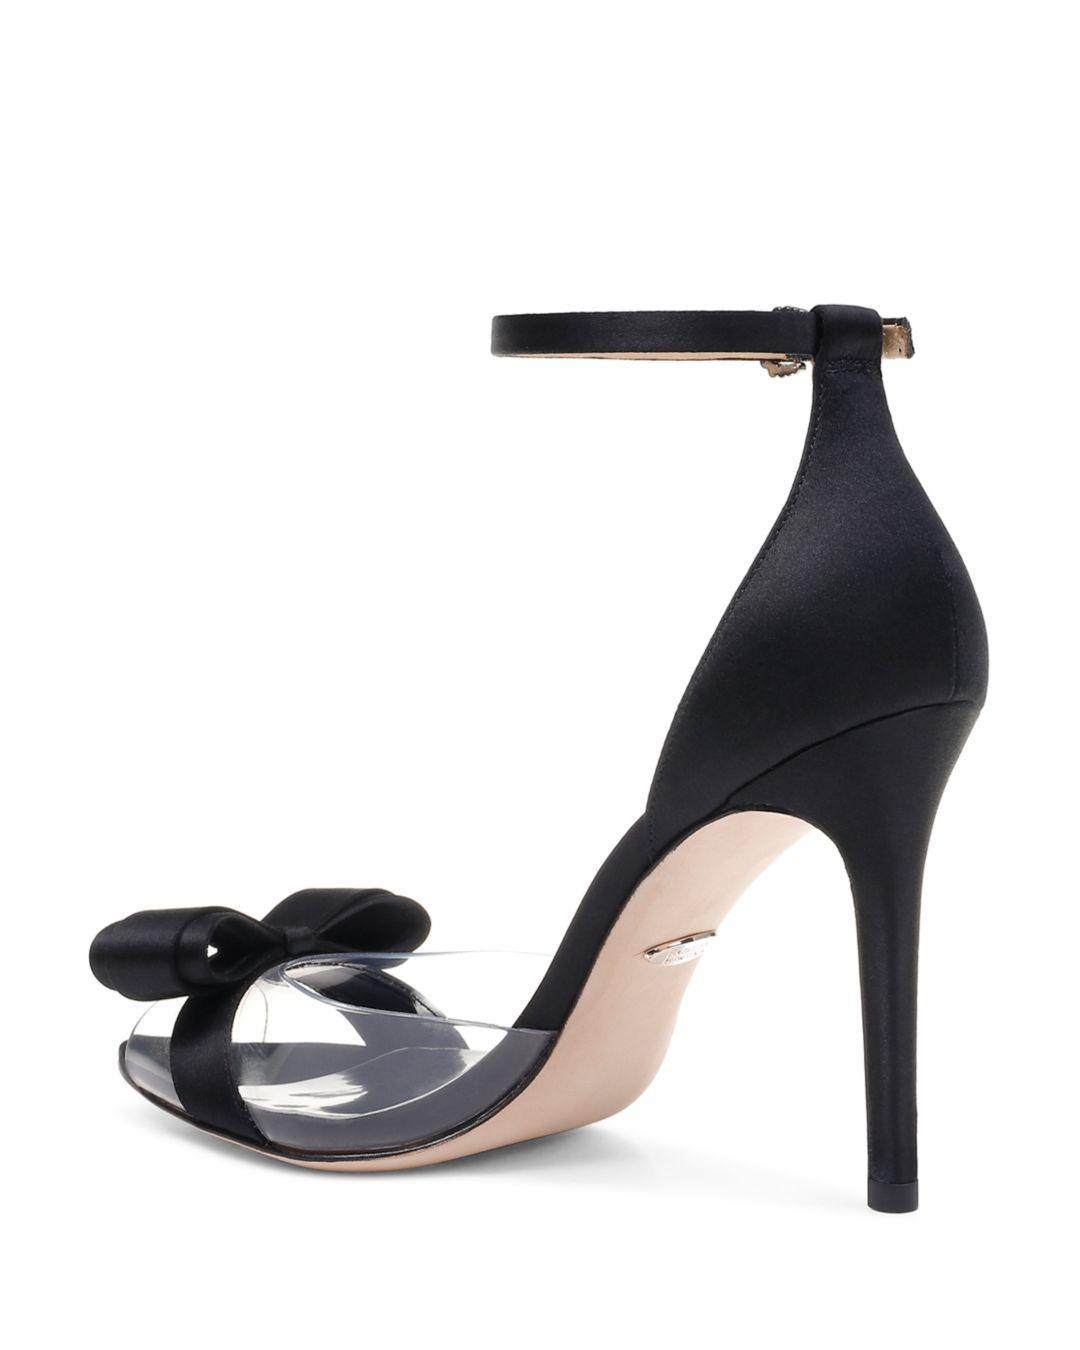 b0159444a8 Badgley Mischka Women's Lindsay Clear Peep Toe Pumps - Lyst